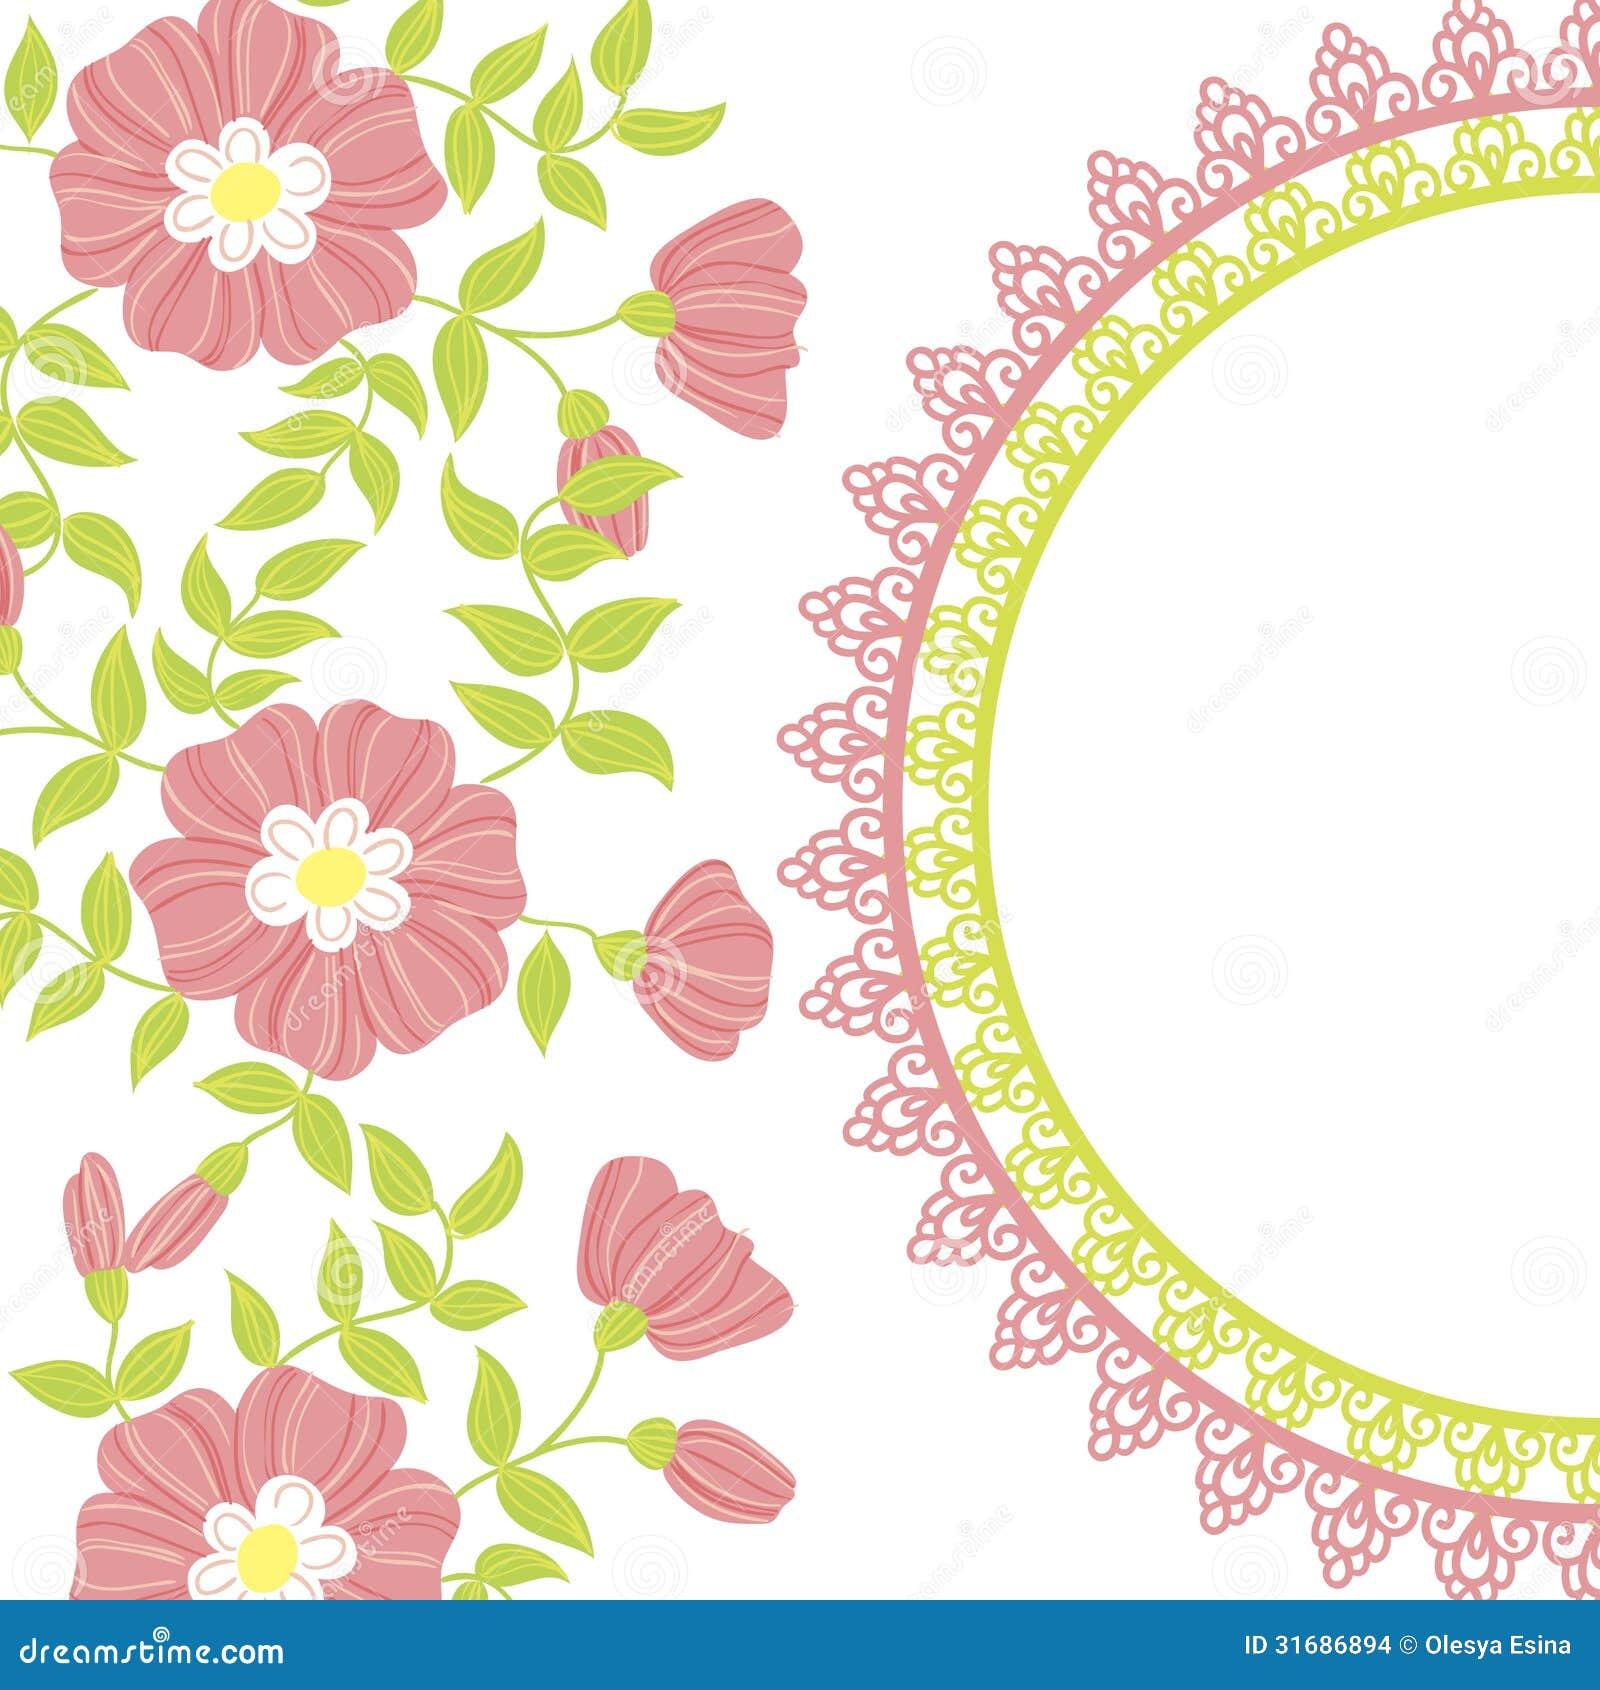 Flower Background Stock Photo. Image Of Petal, Image